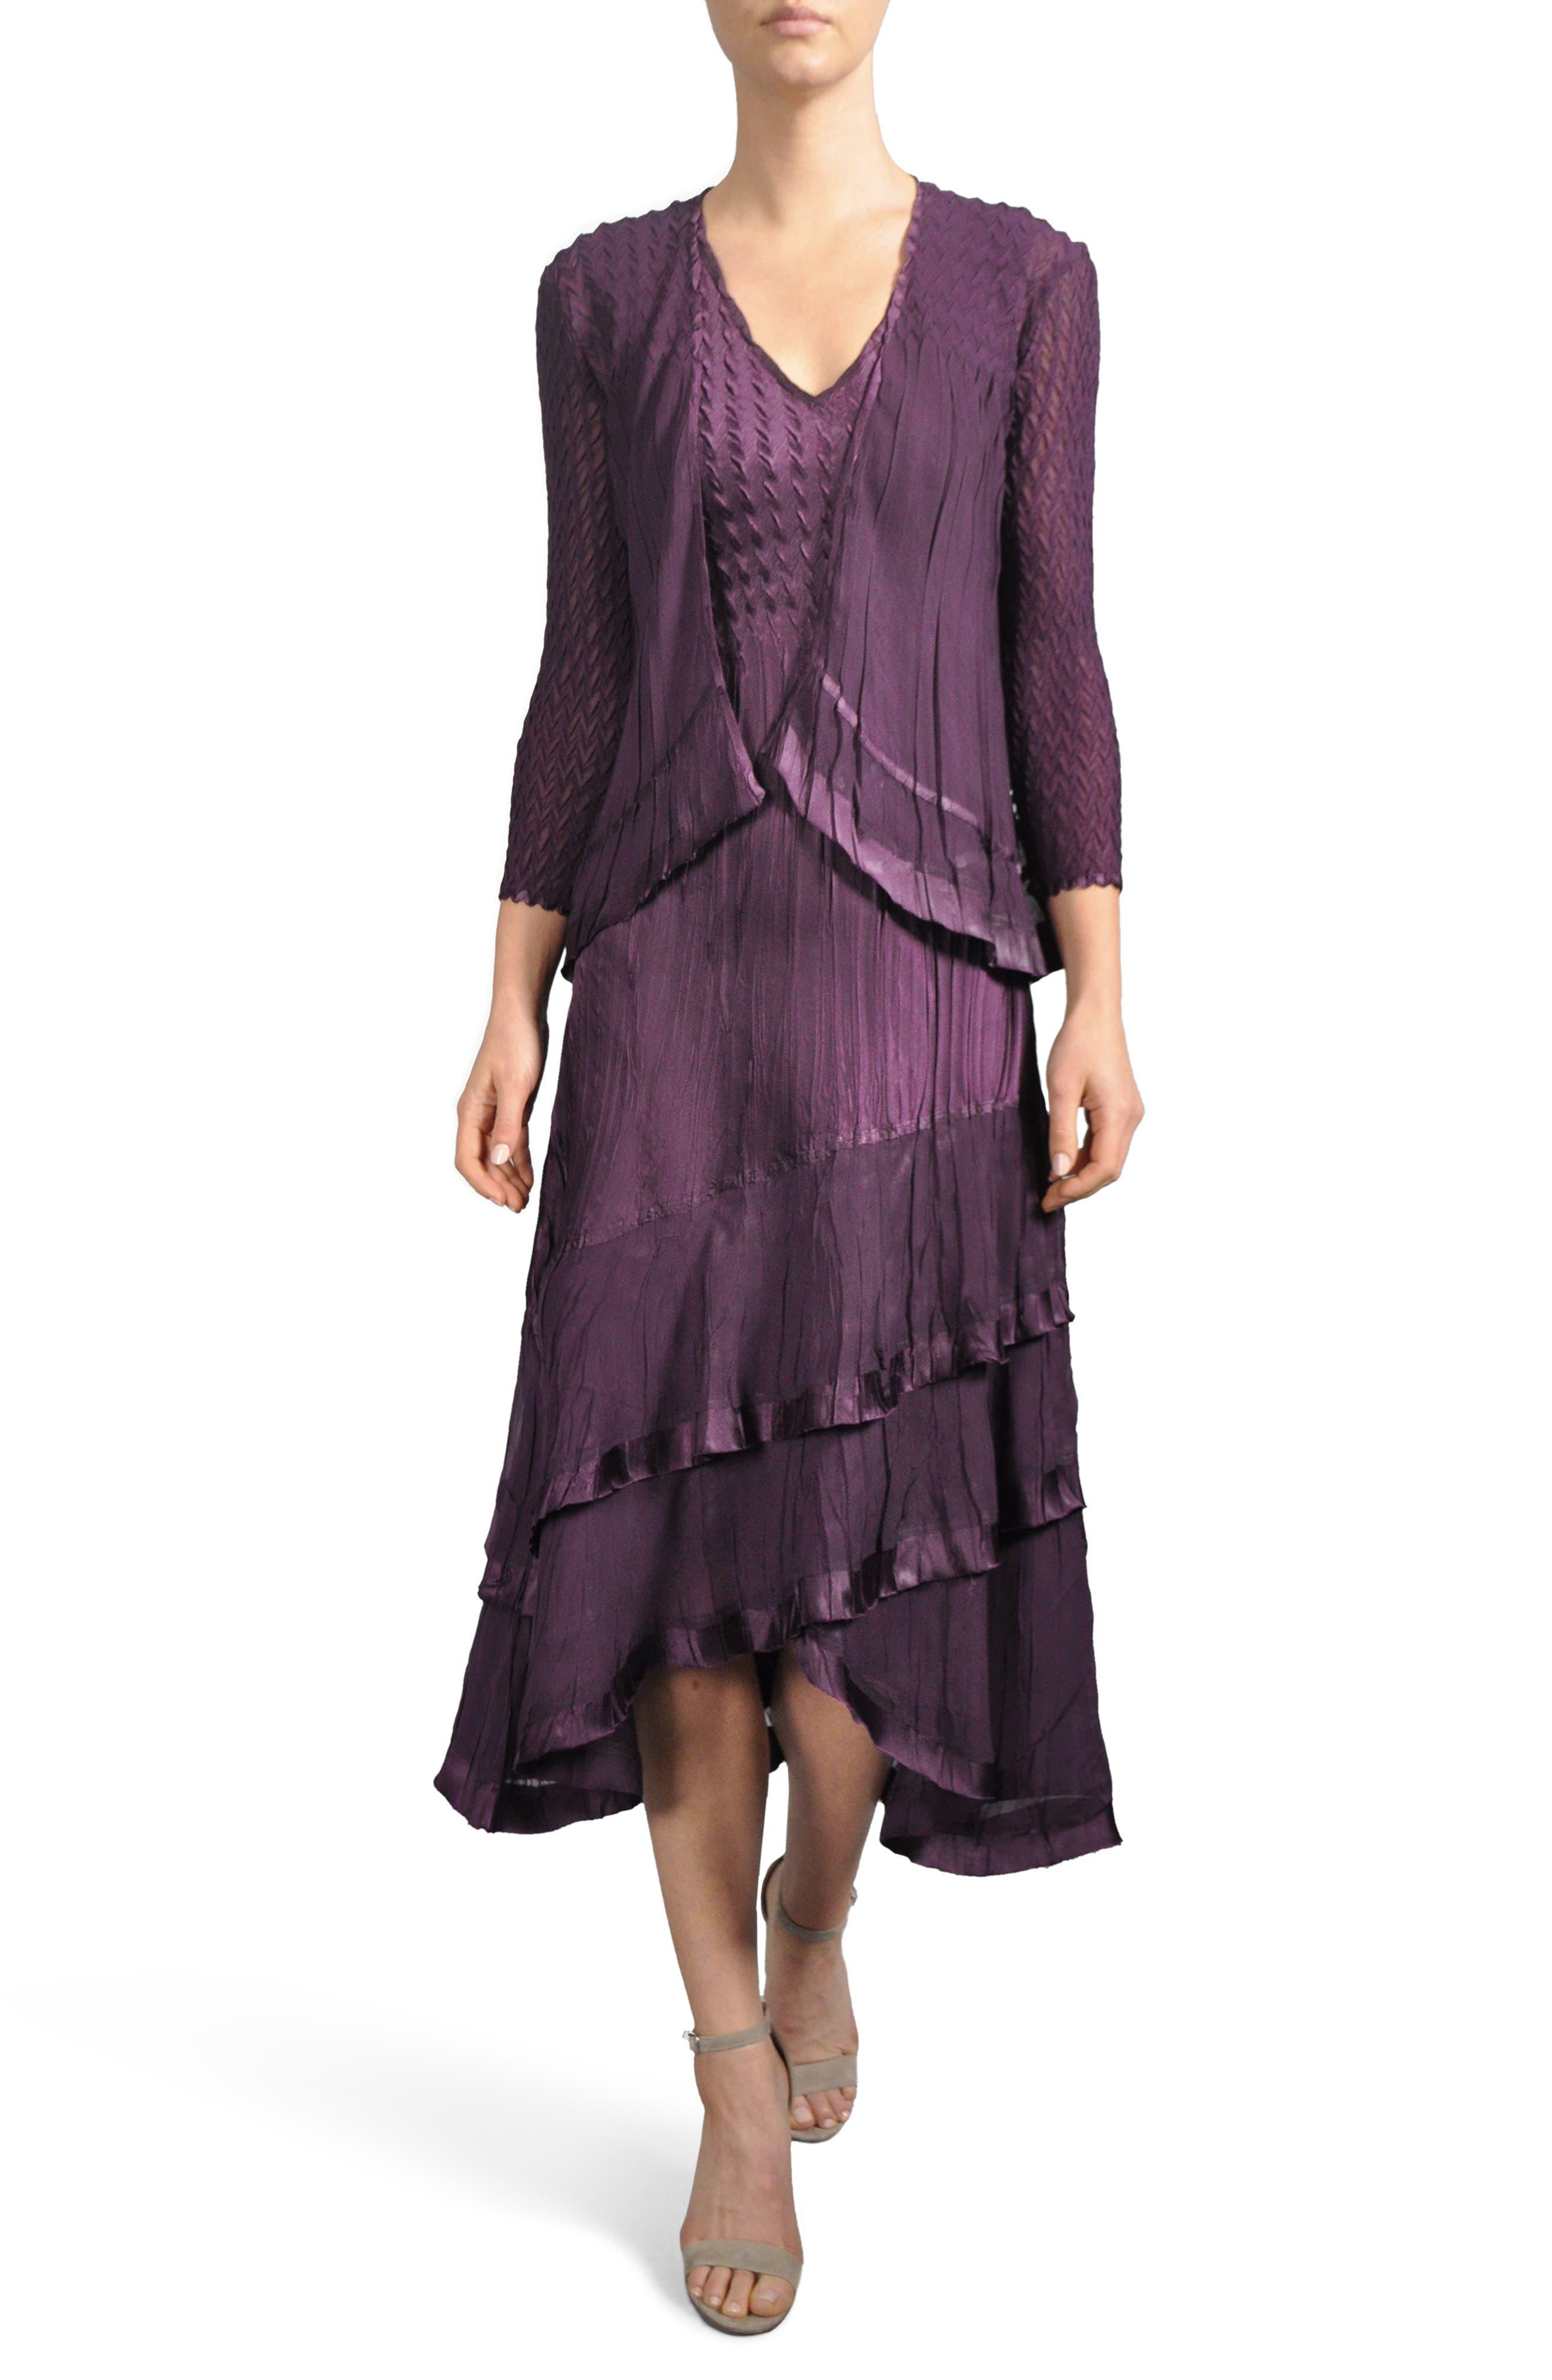 Komorov Textured Tiered Midi Dress with Jacket,                             Main thumbnail 1, color,                             Aubergine